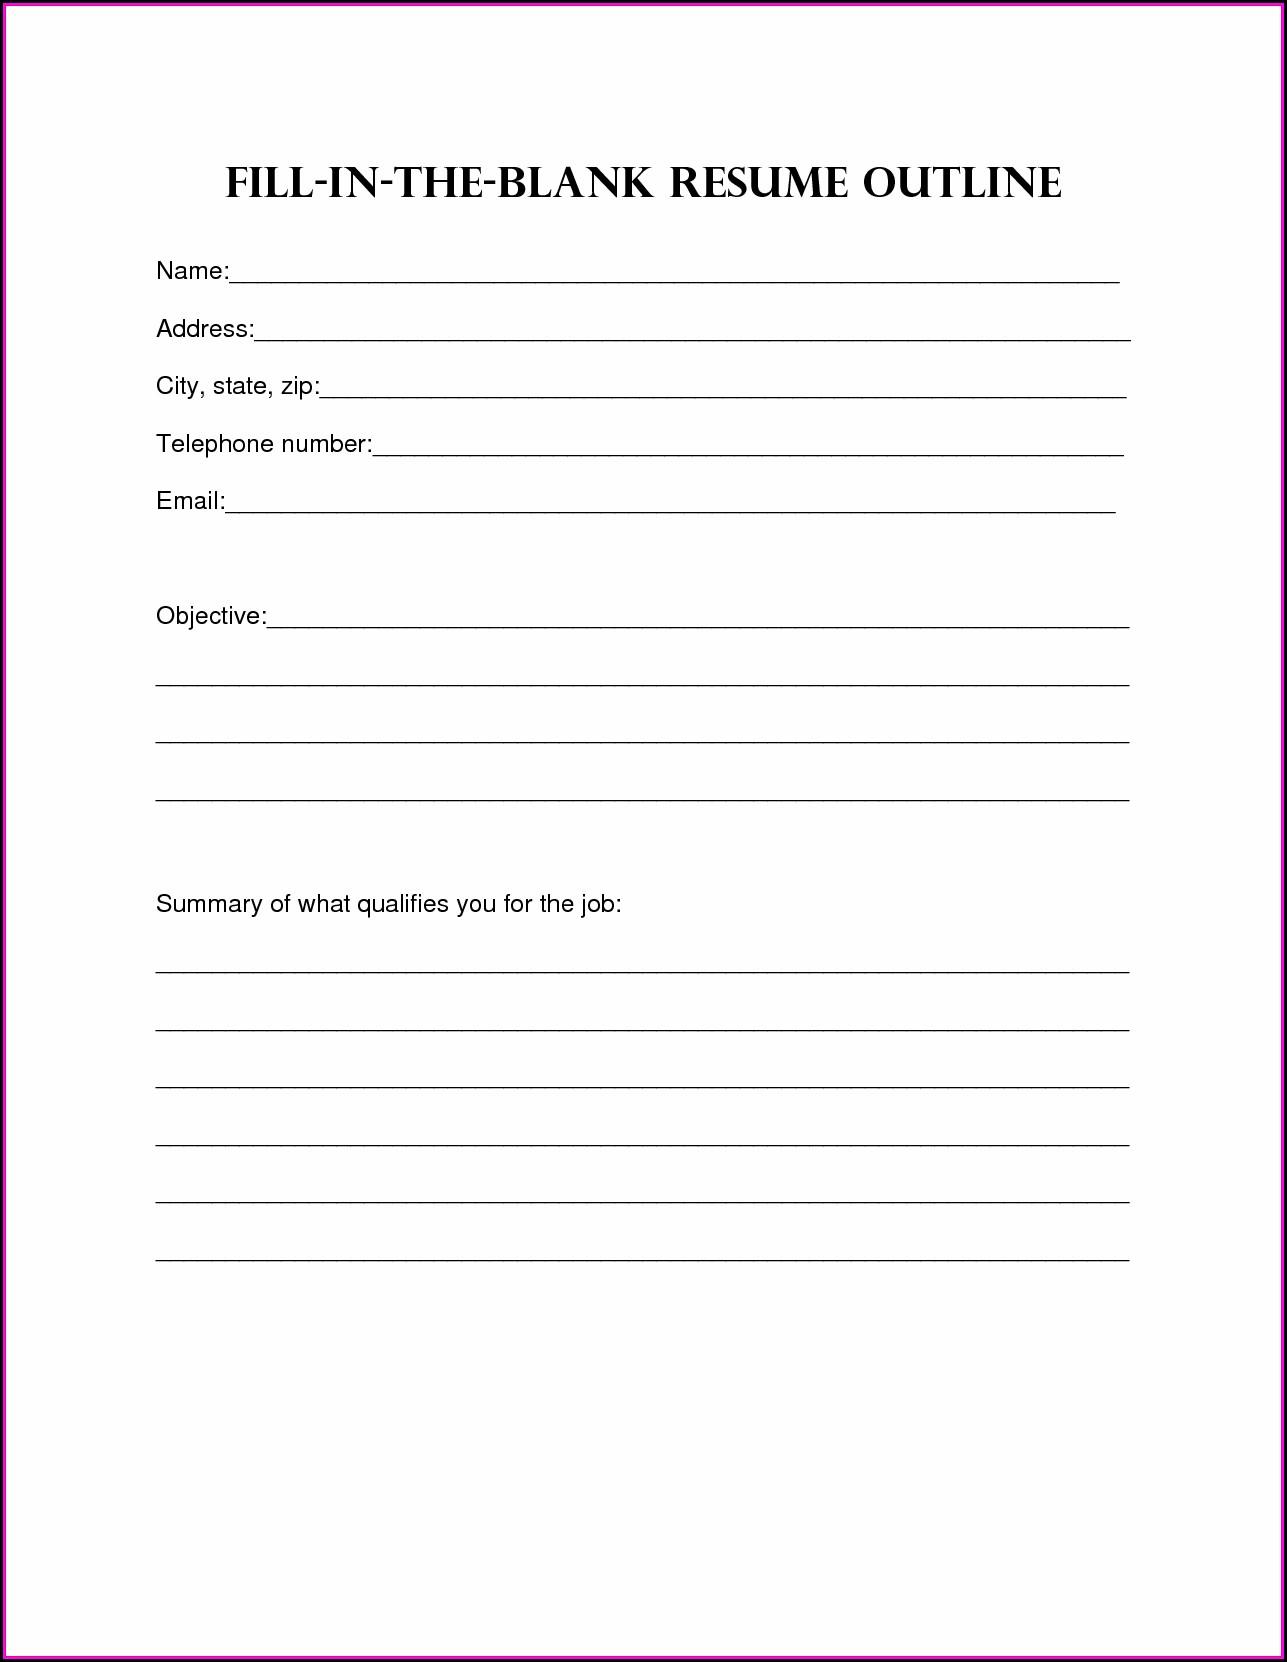 Fill In Blank Resume